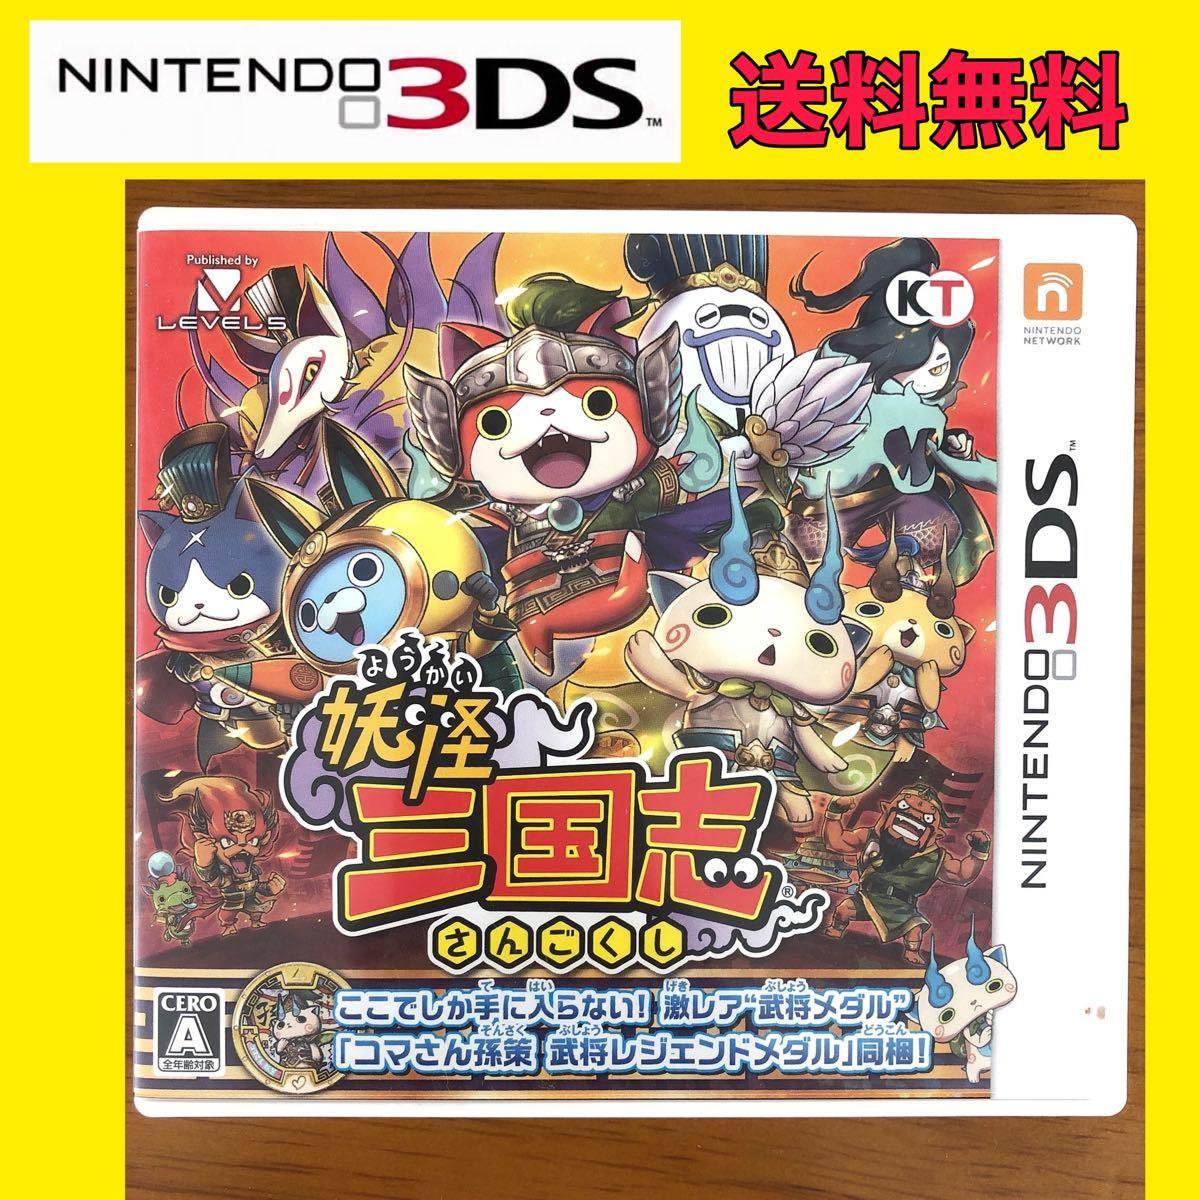 Nintendo 3DS 妖怪三国志 任天堂 ニンテンドー 妖怪ウォッチ